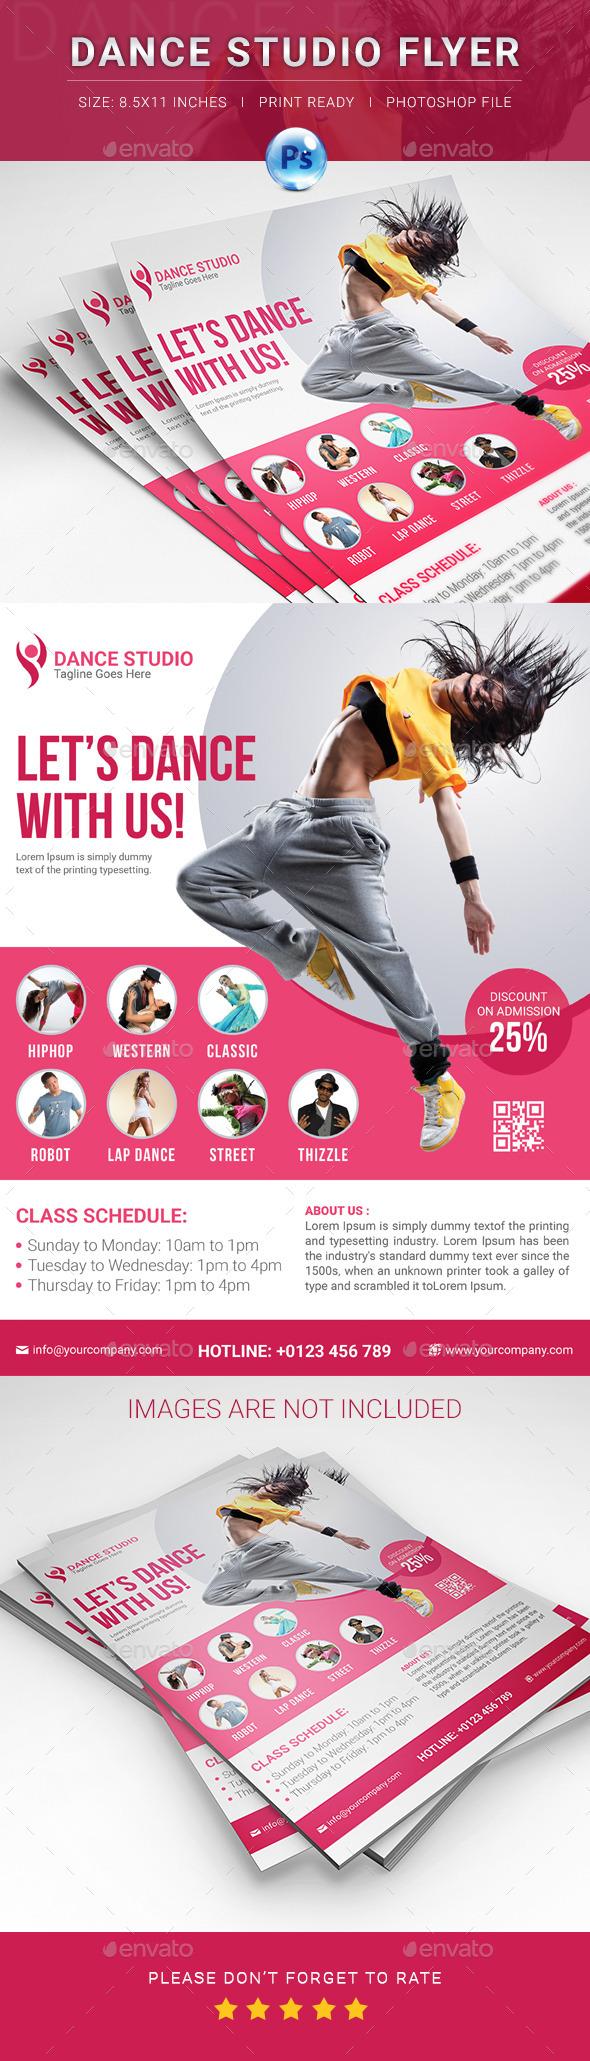 Dance Studio Flyer - Flyers Print Templates